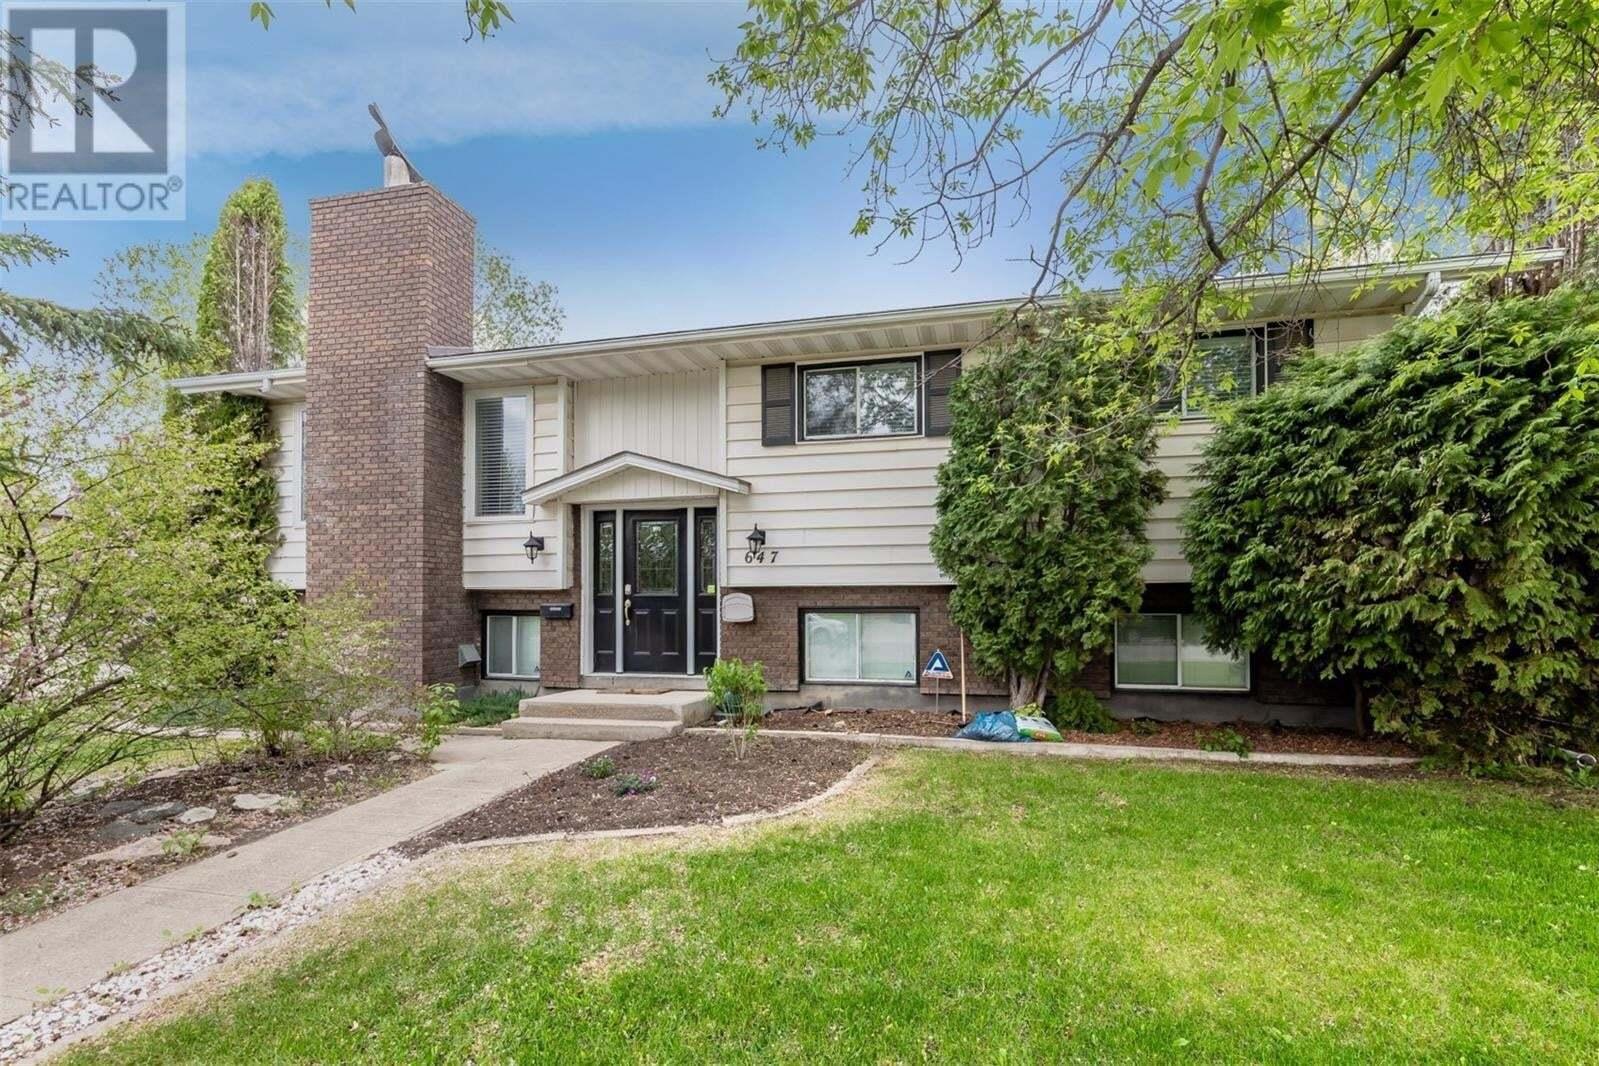 House for sale at 647 Redberry Rd Saskatoon Saskatchewan - MLS: SK810288